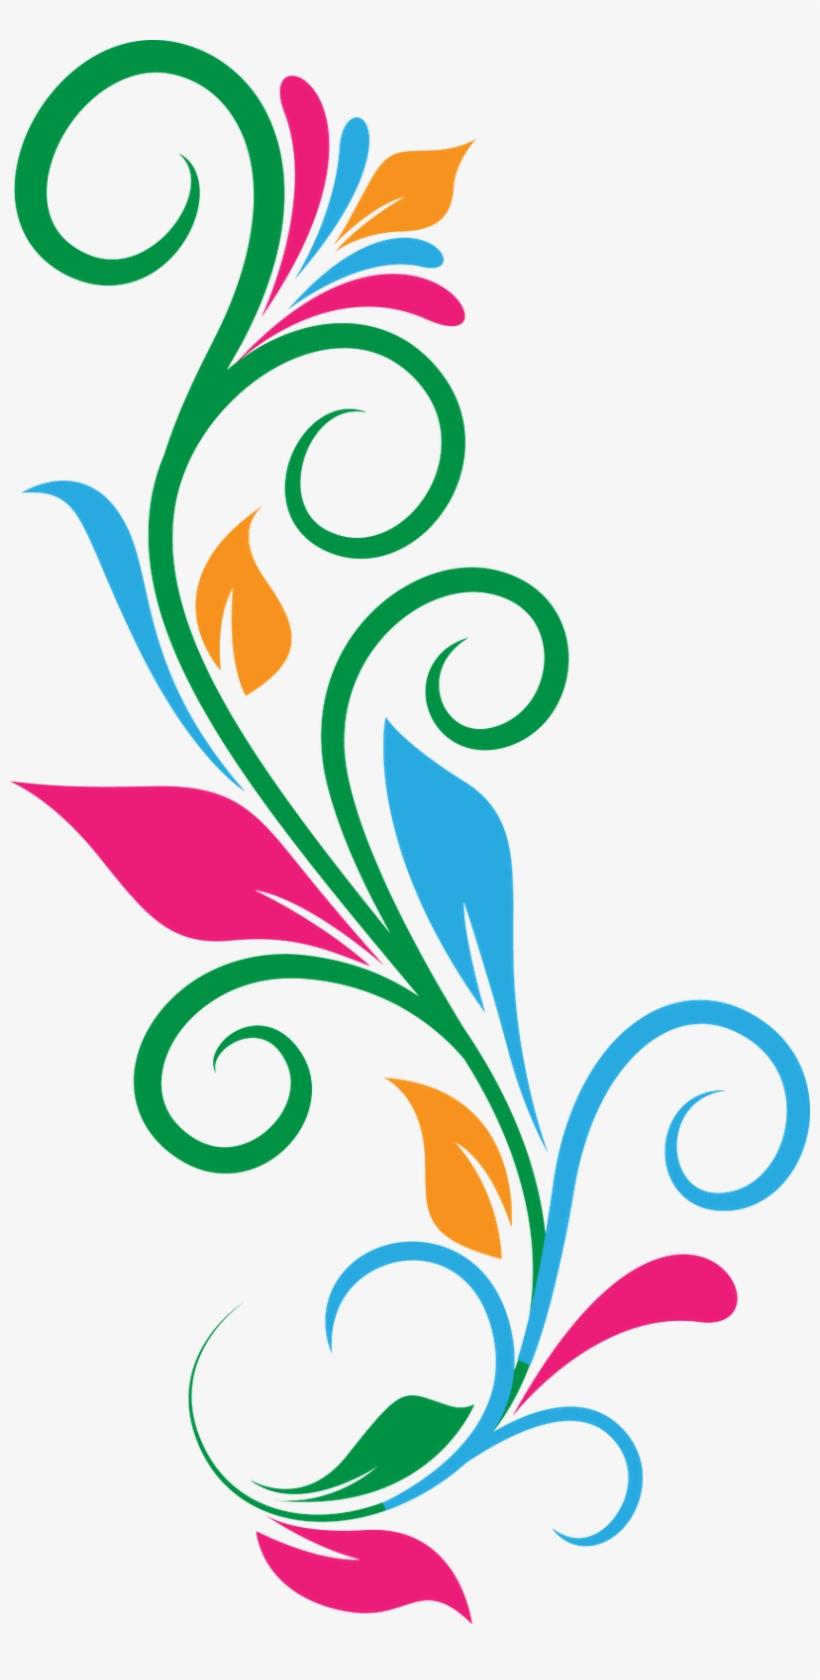 Colorful Floral Design Png PNG Images.